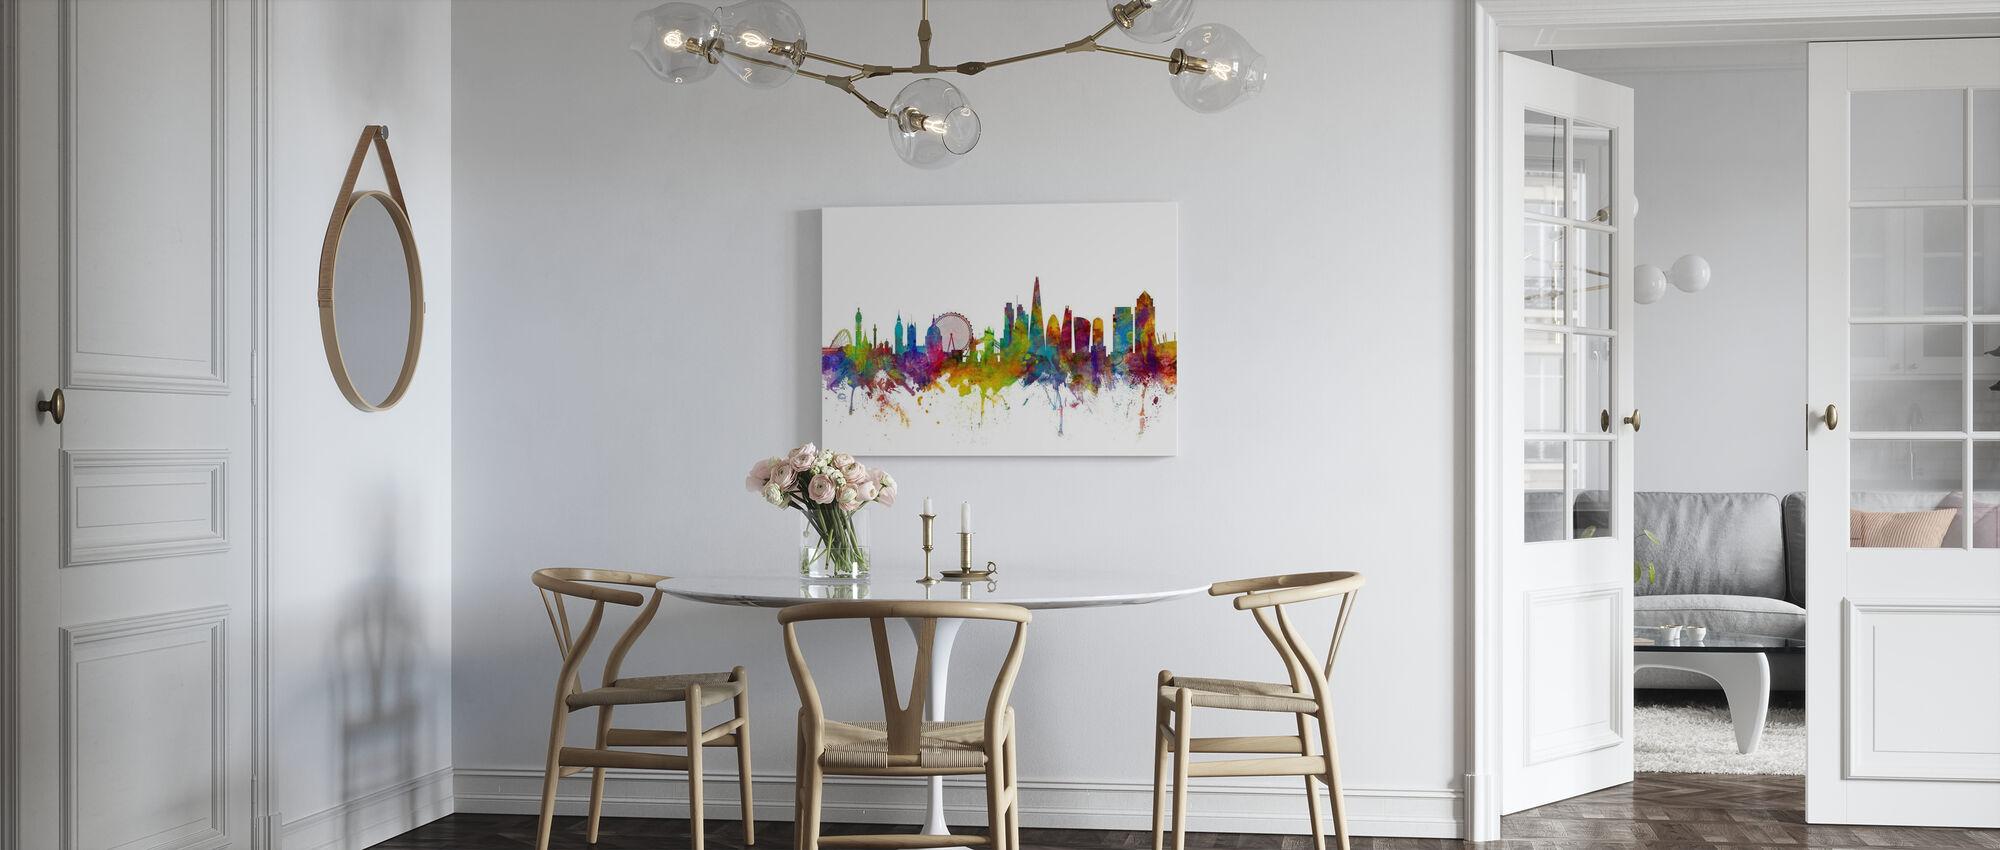 London Canary Wharf skyline - Canvas print - Kitchen